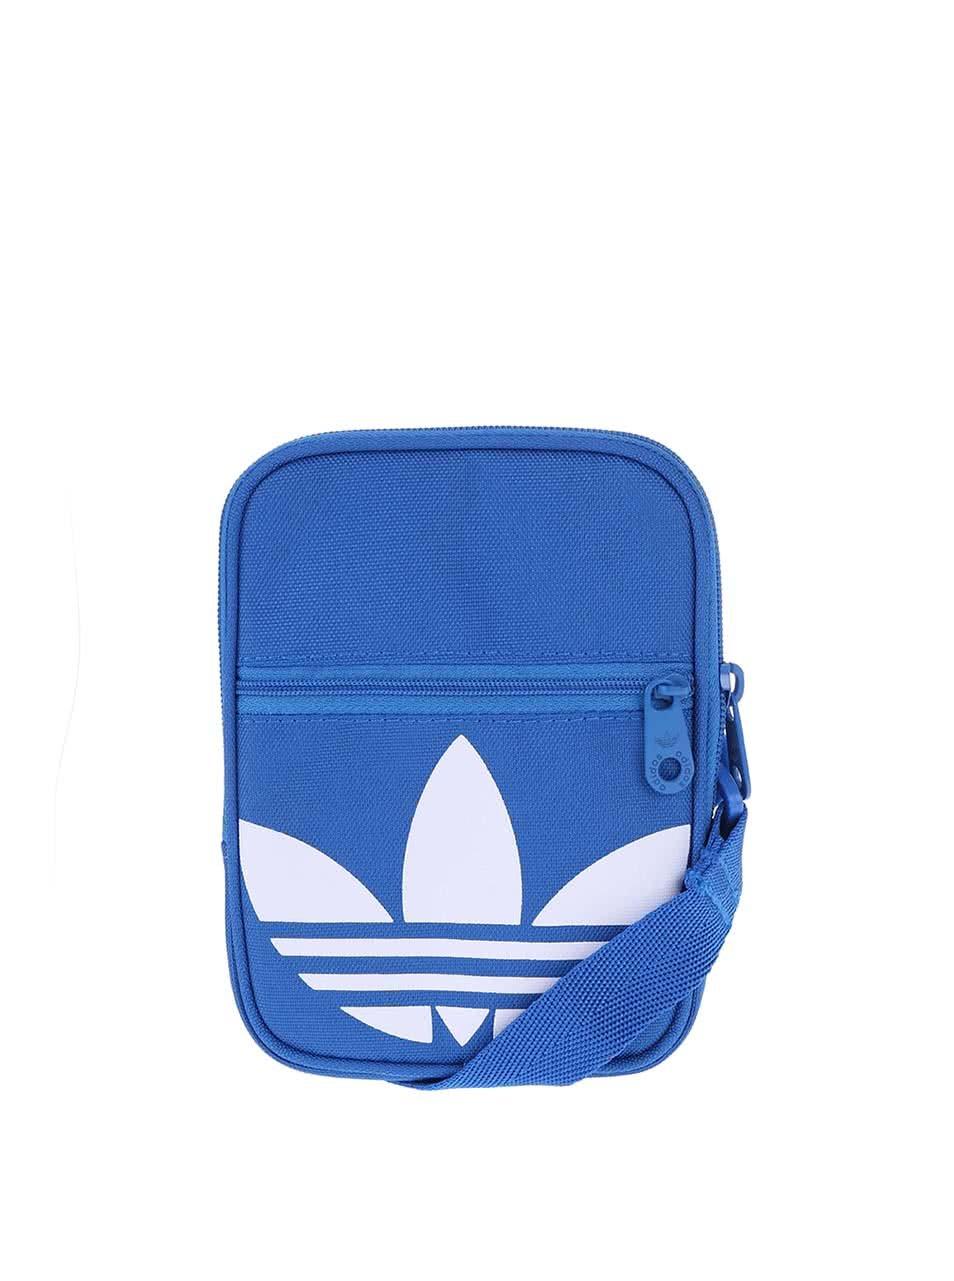 Bílo-modrá malá taška přes rameno adidas Originals